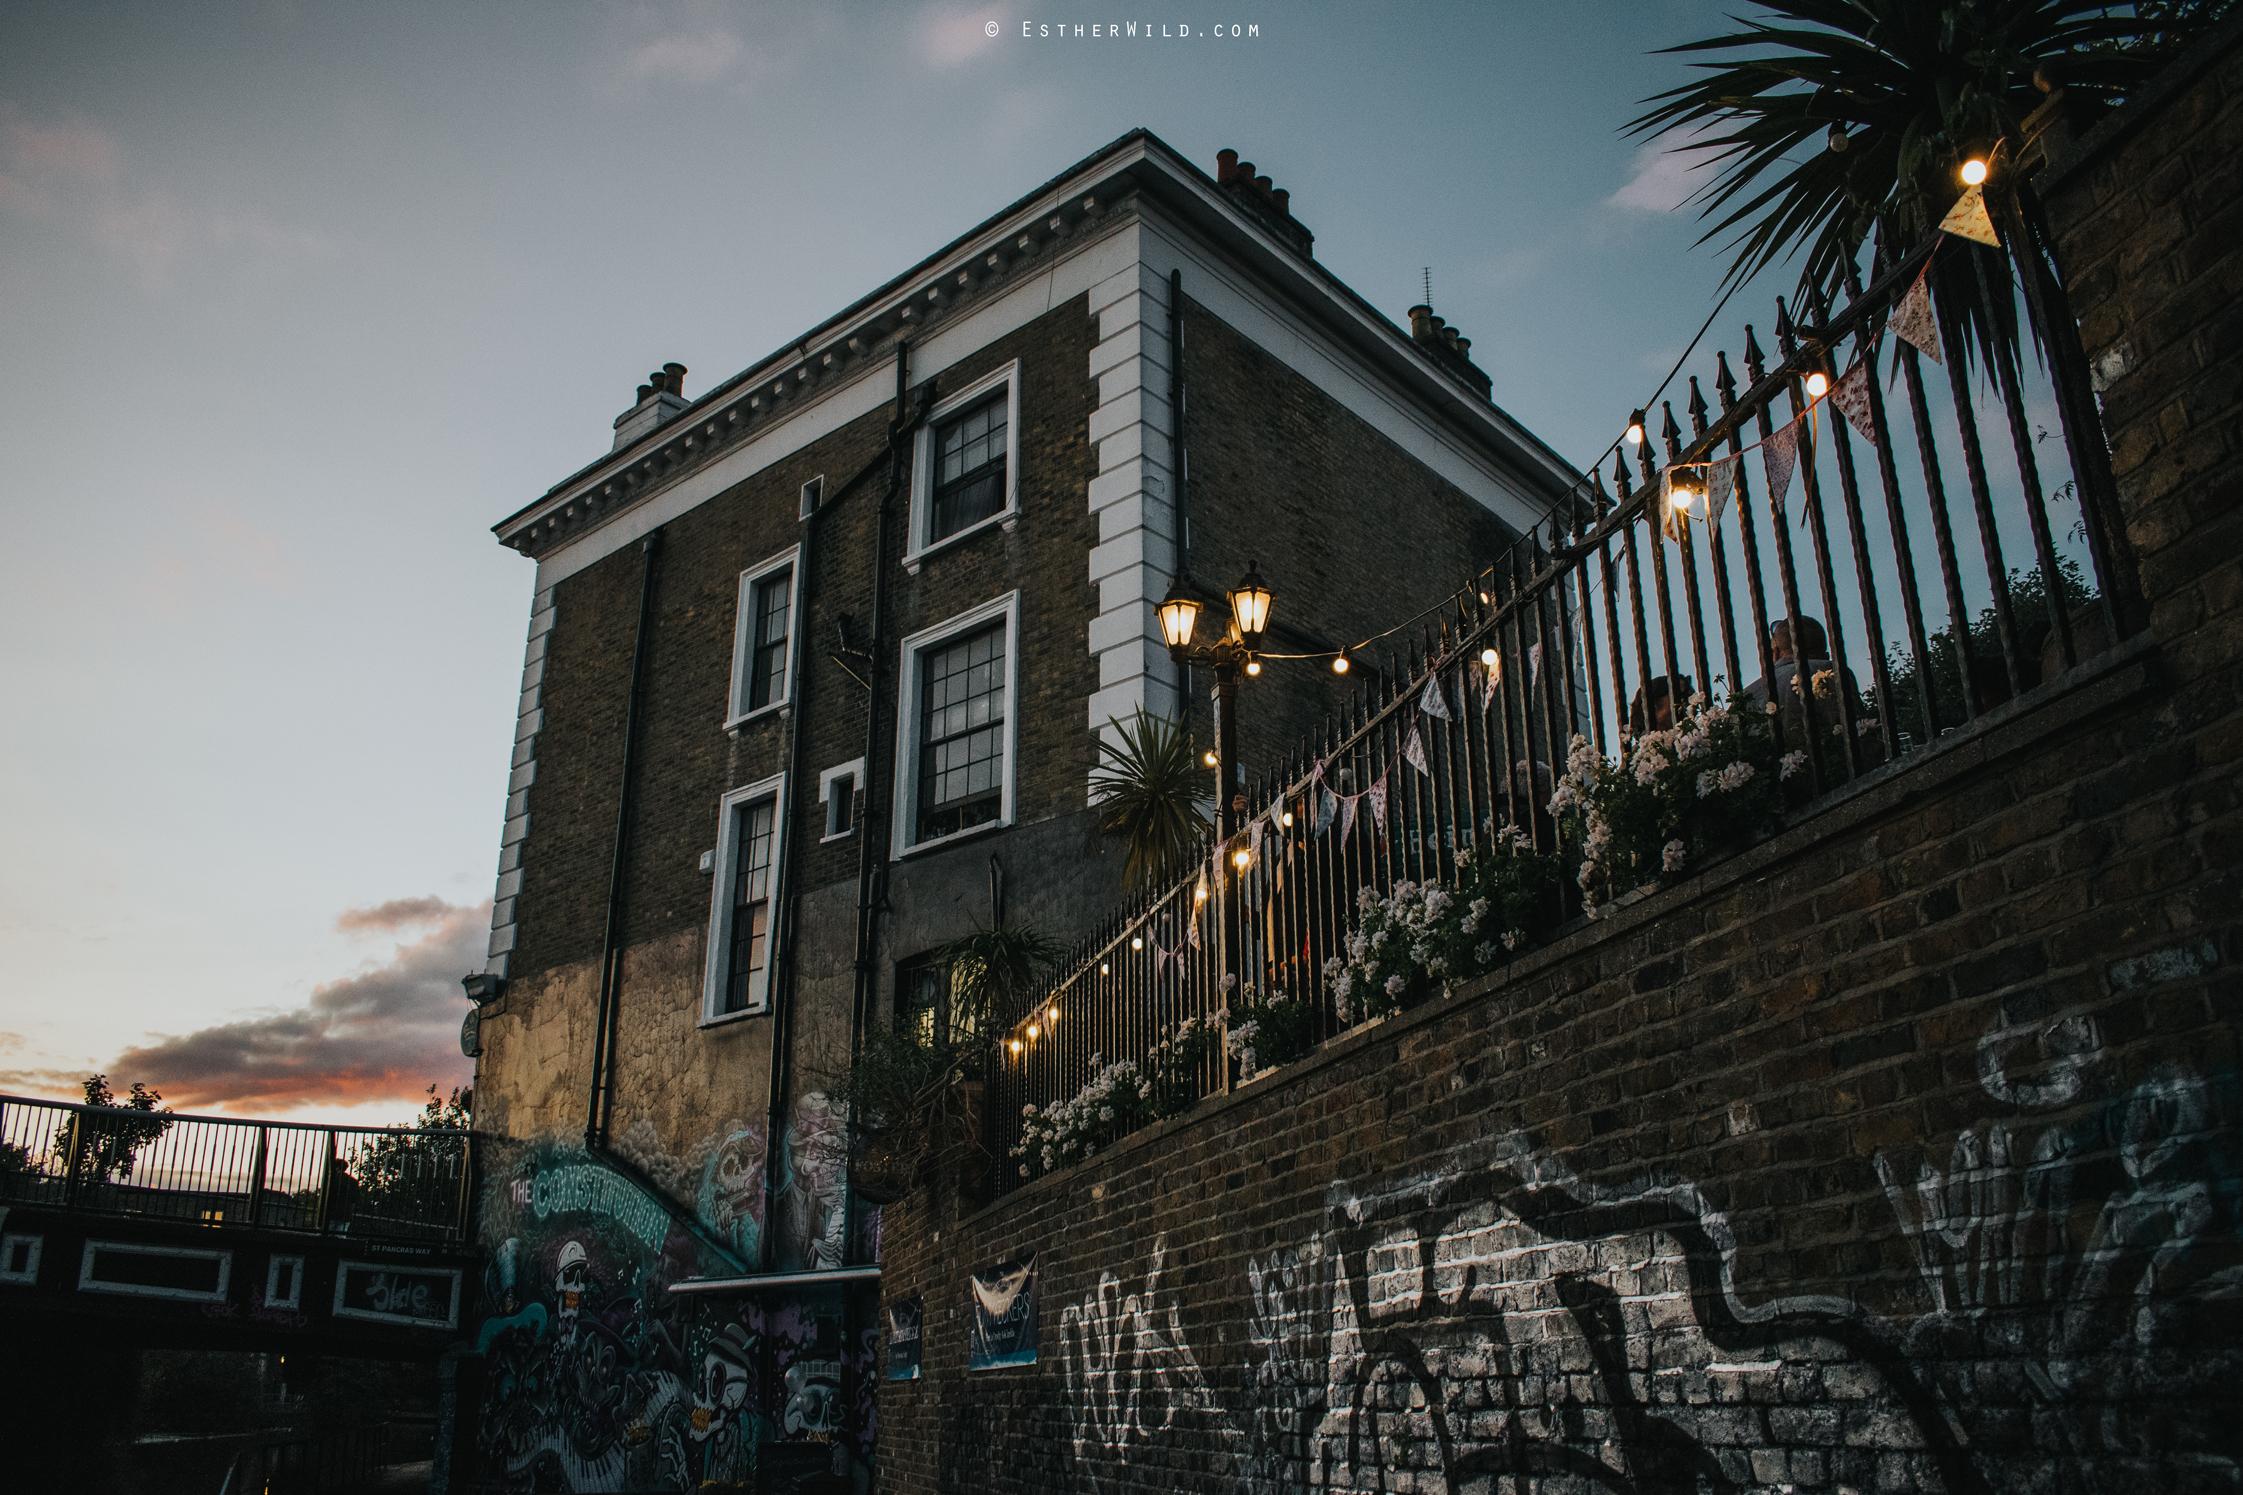 Islington_Town_Hall_Wedding_London_Photographer_Esther_Wild_IMG_8059_DSC_0565.jpg